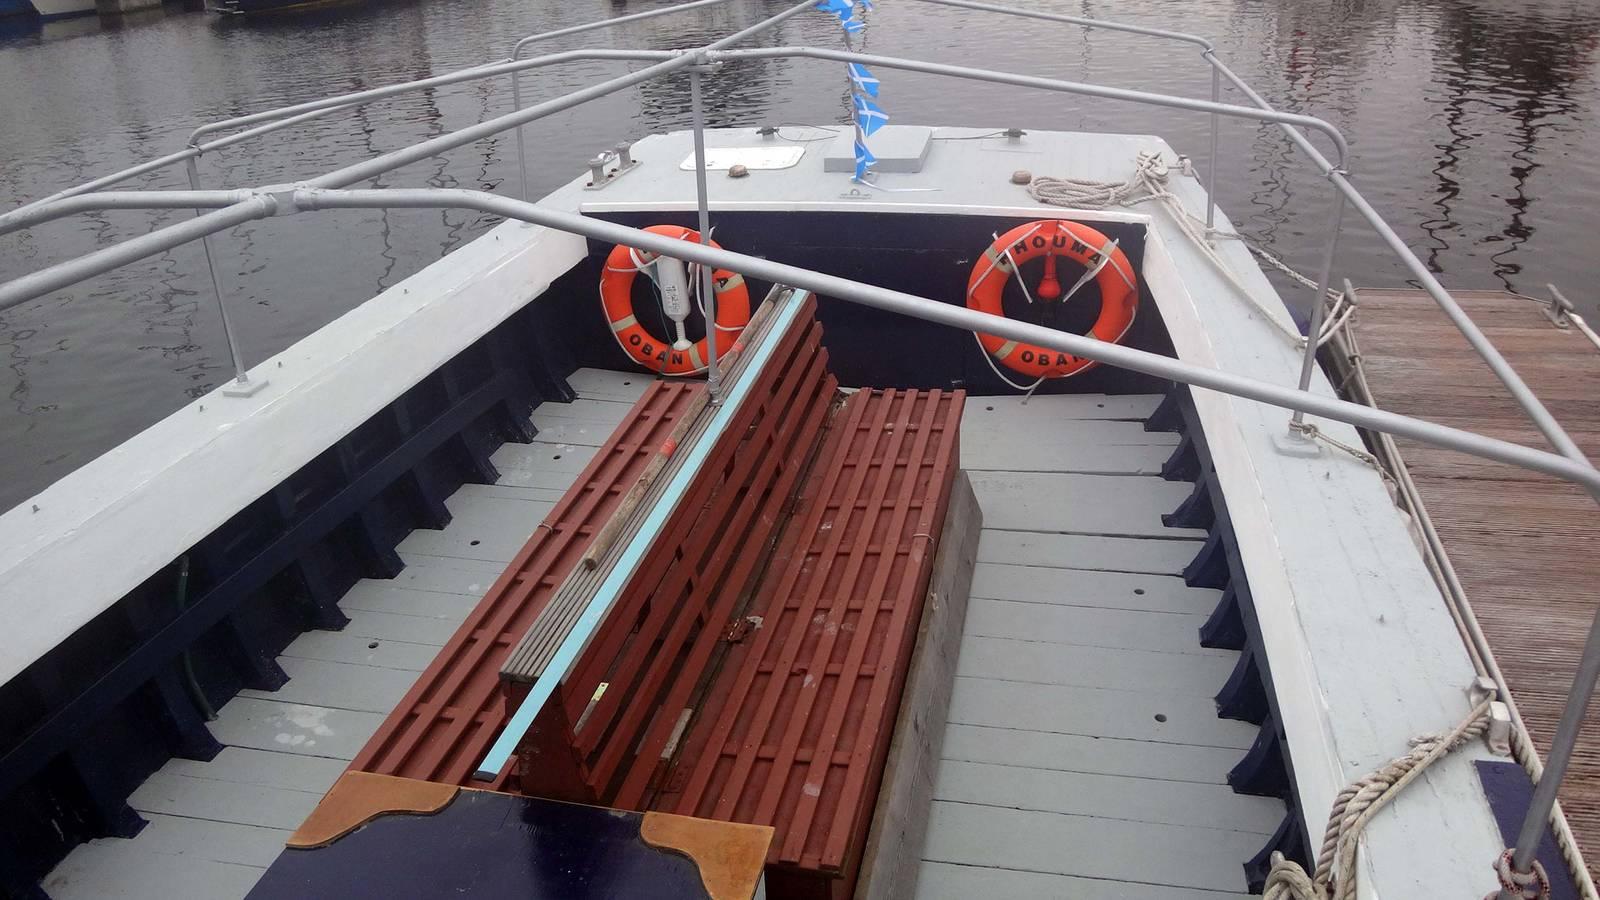 MacCaughy Flit Boat